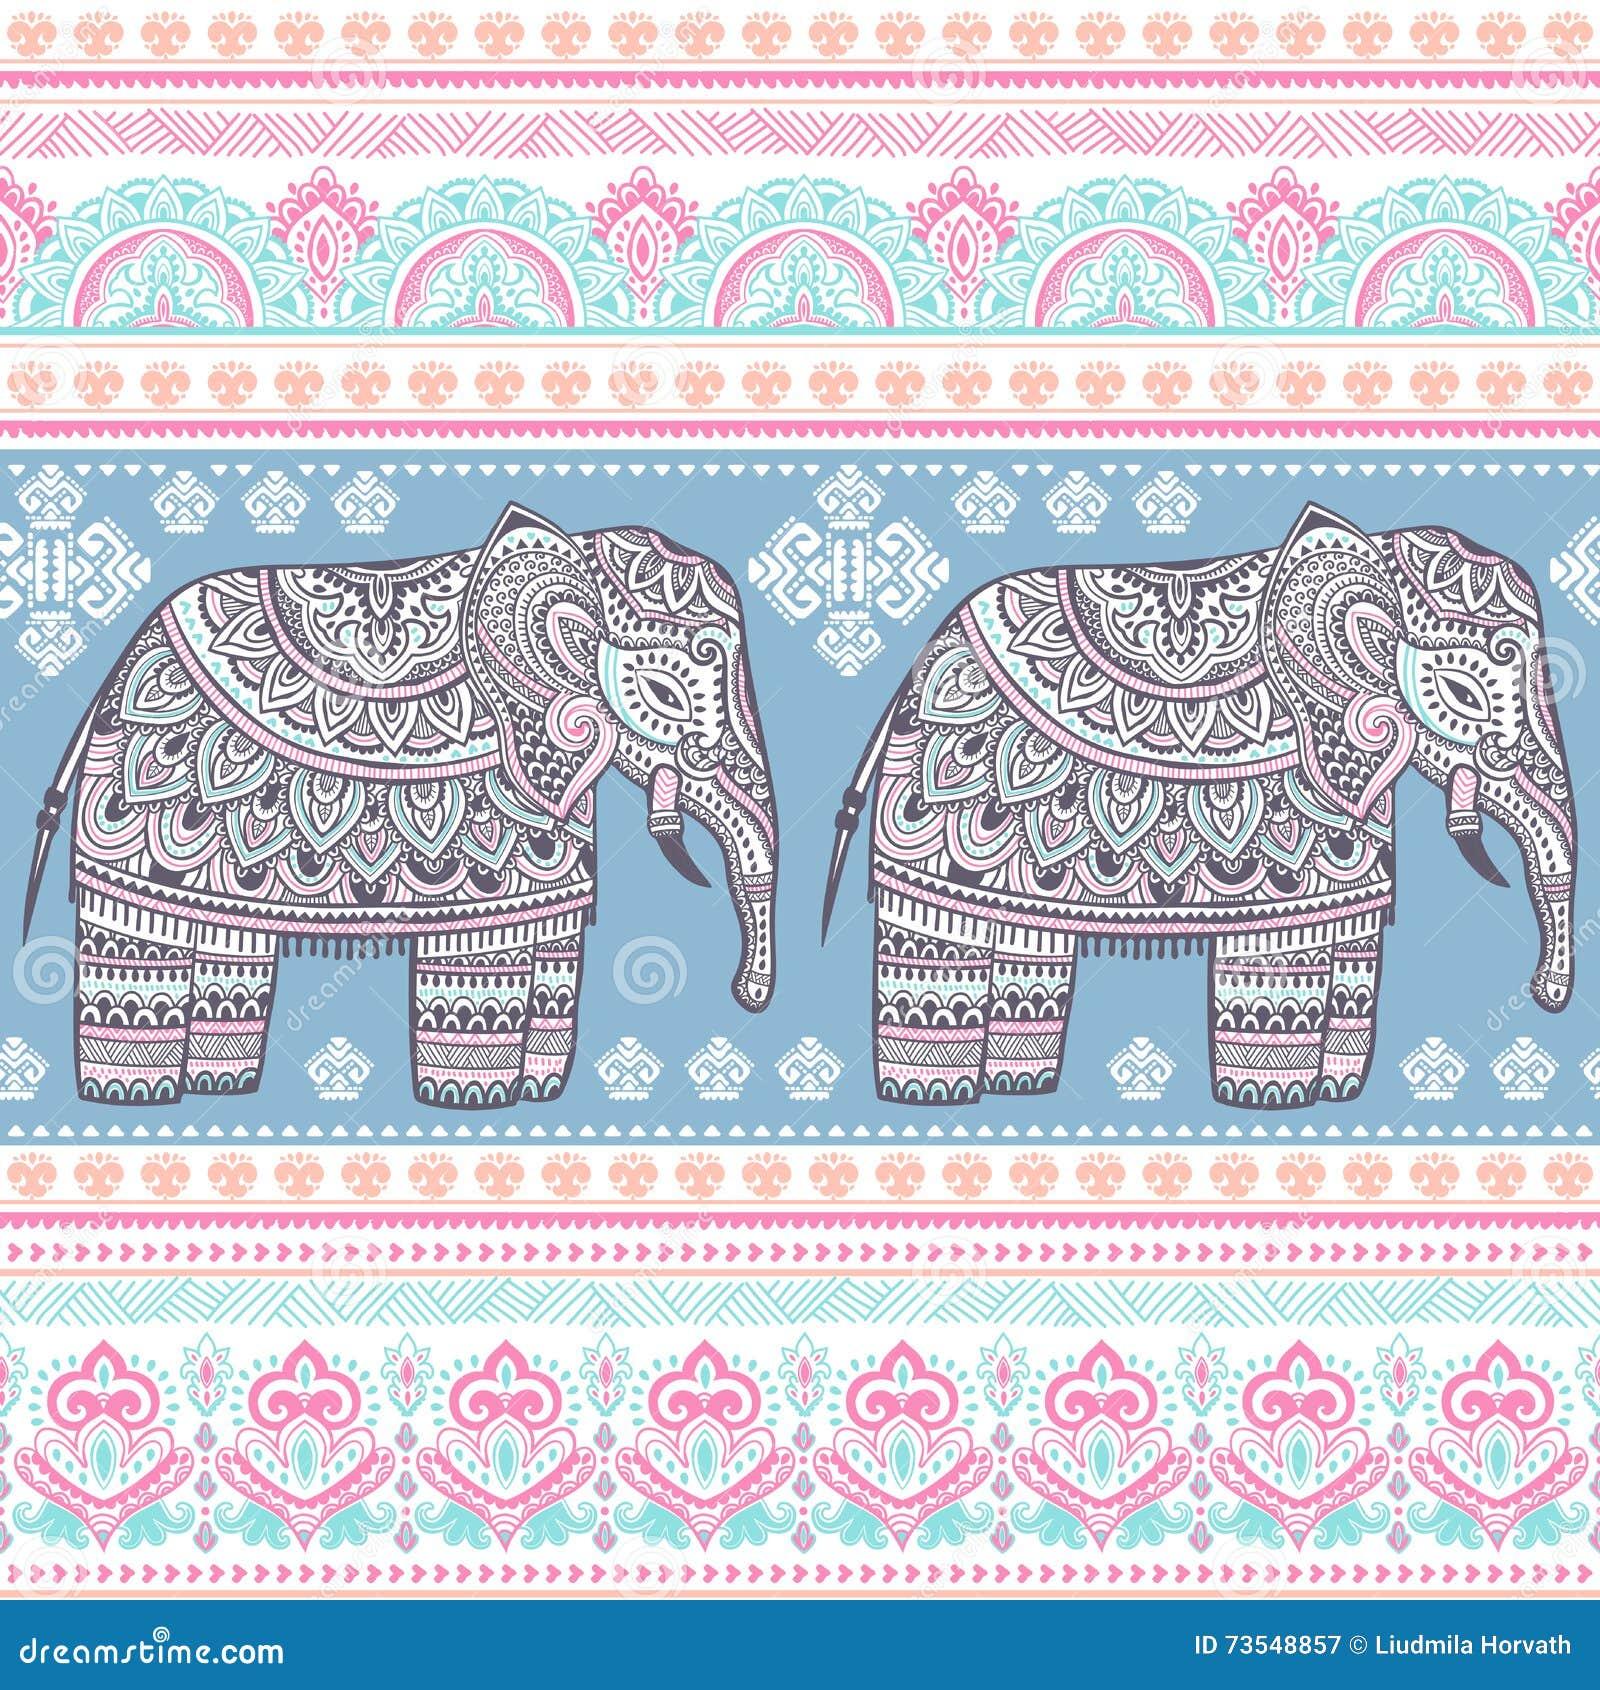 Modelo inconsútil del elefante bohemio indio étnico del estilo